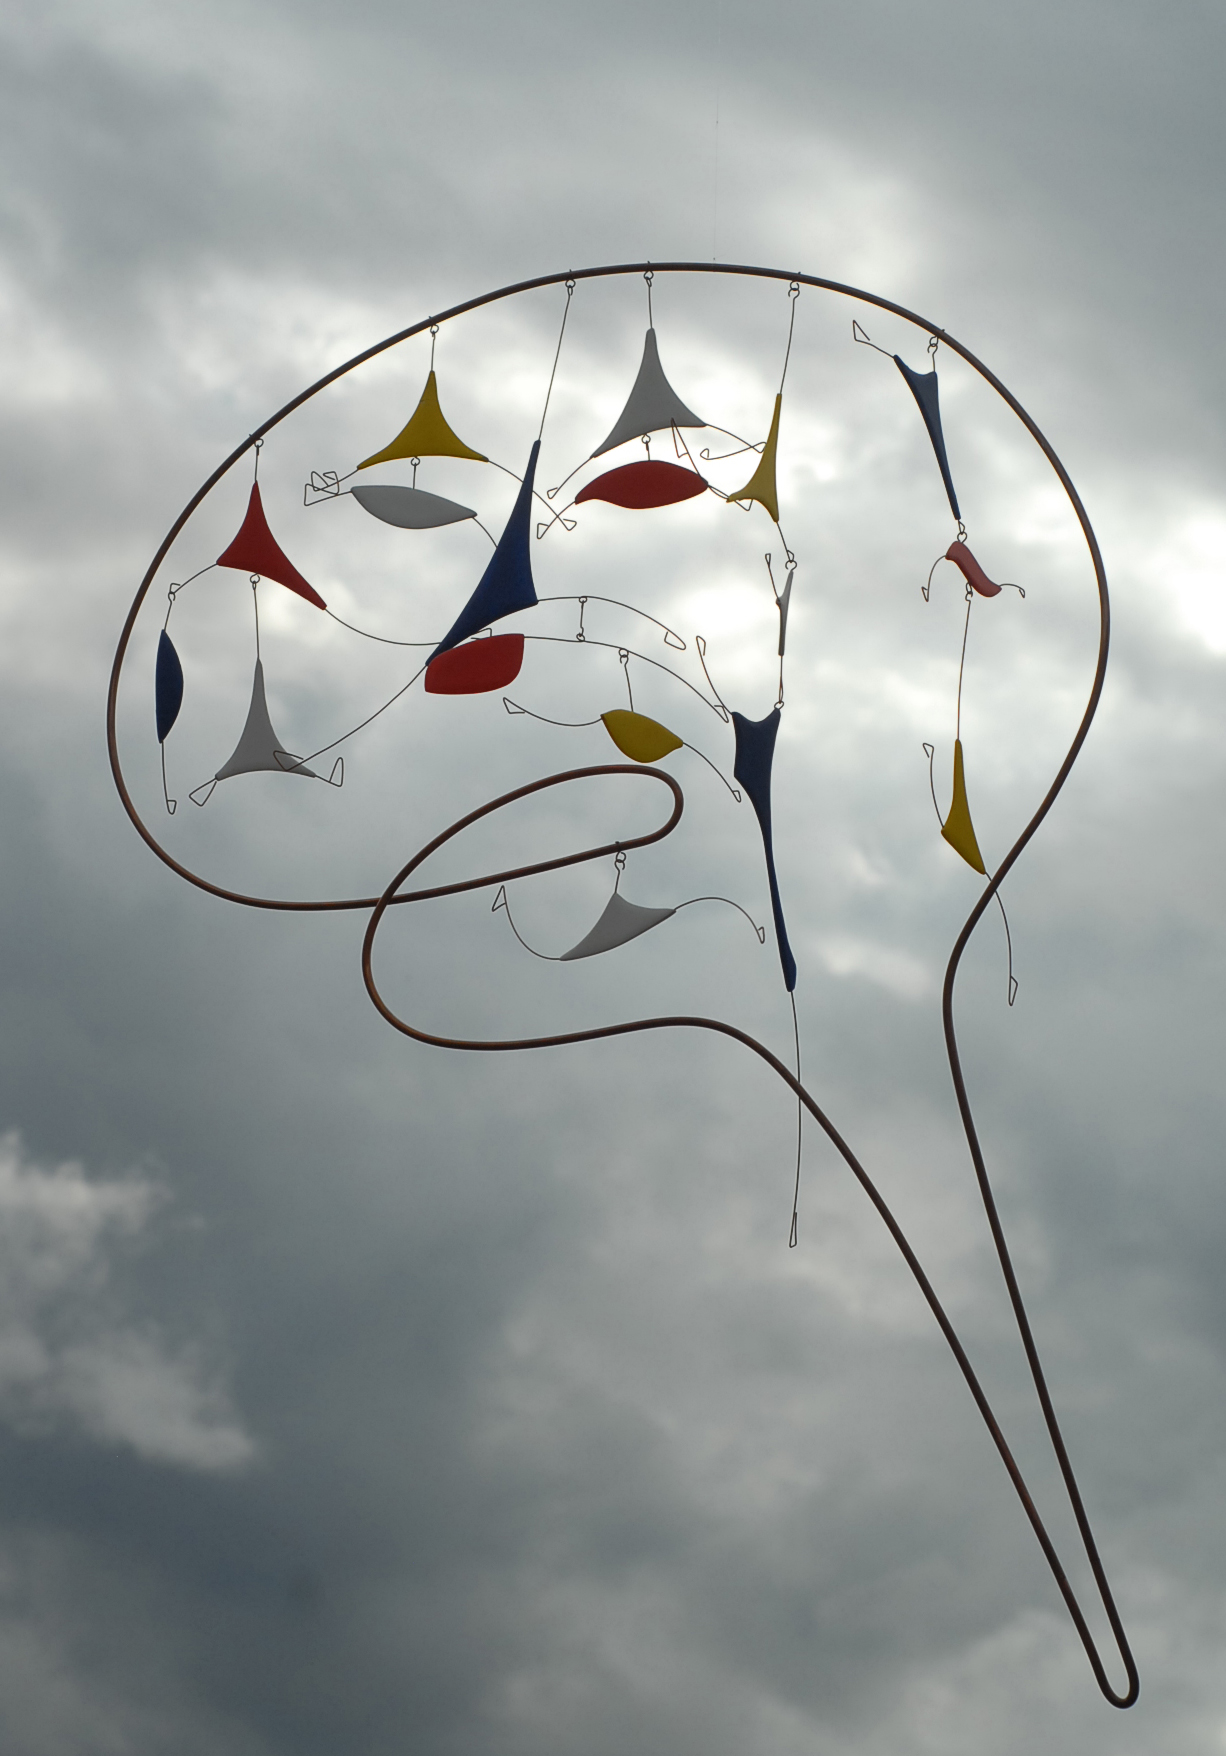 Calder's brain